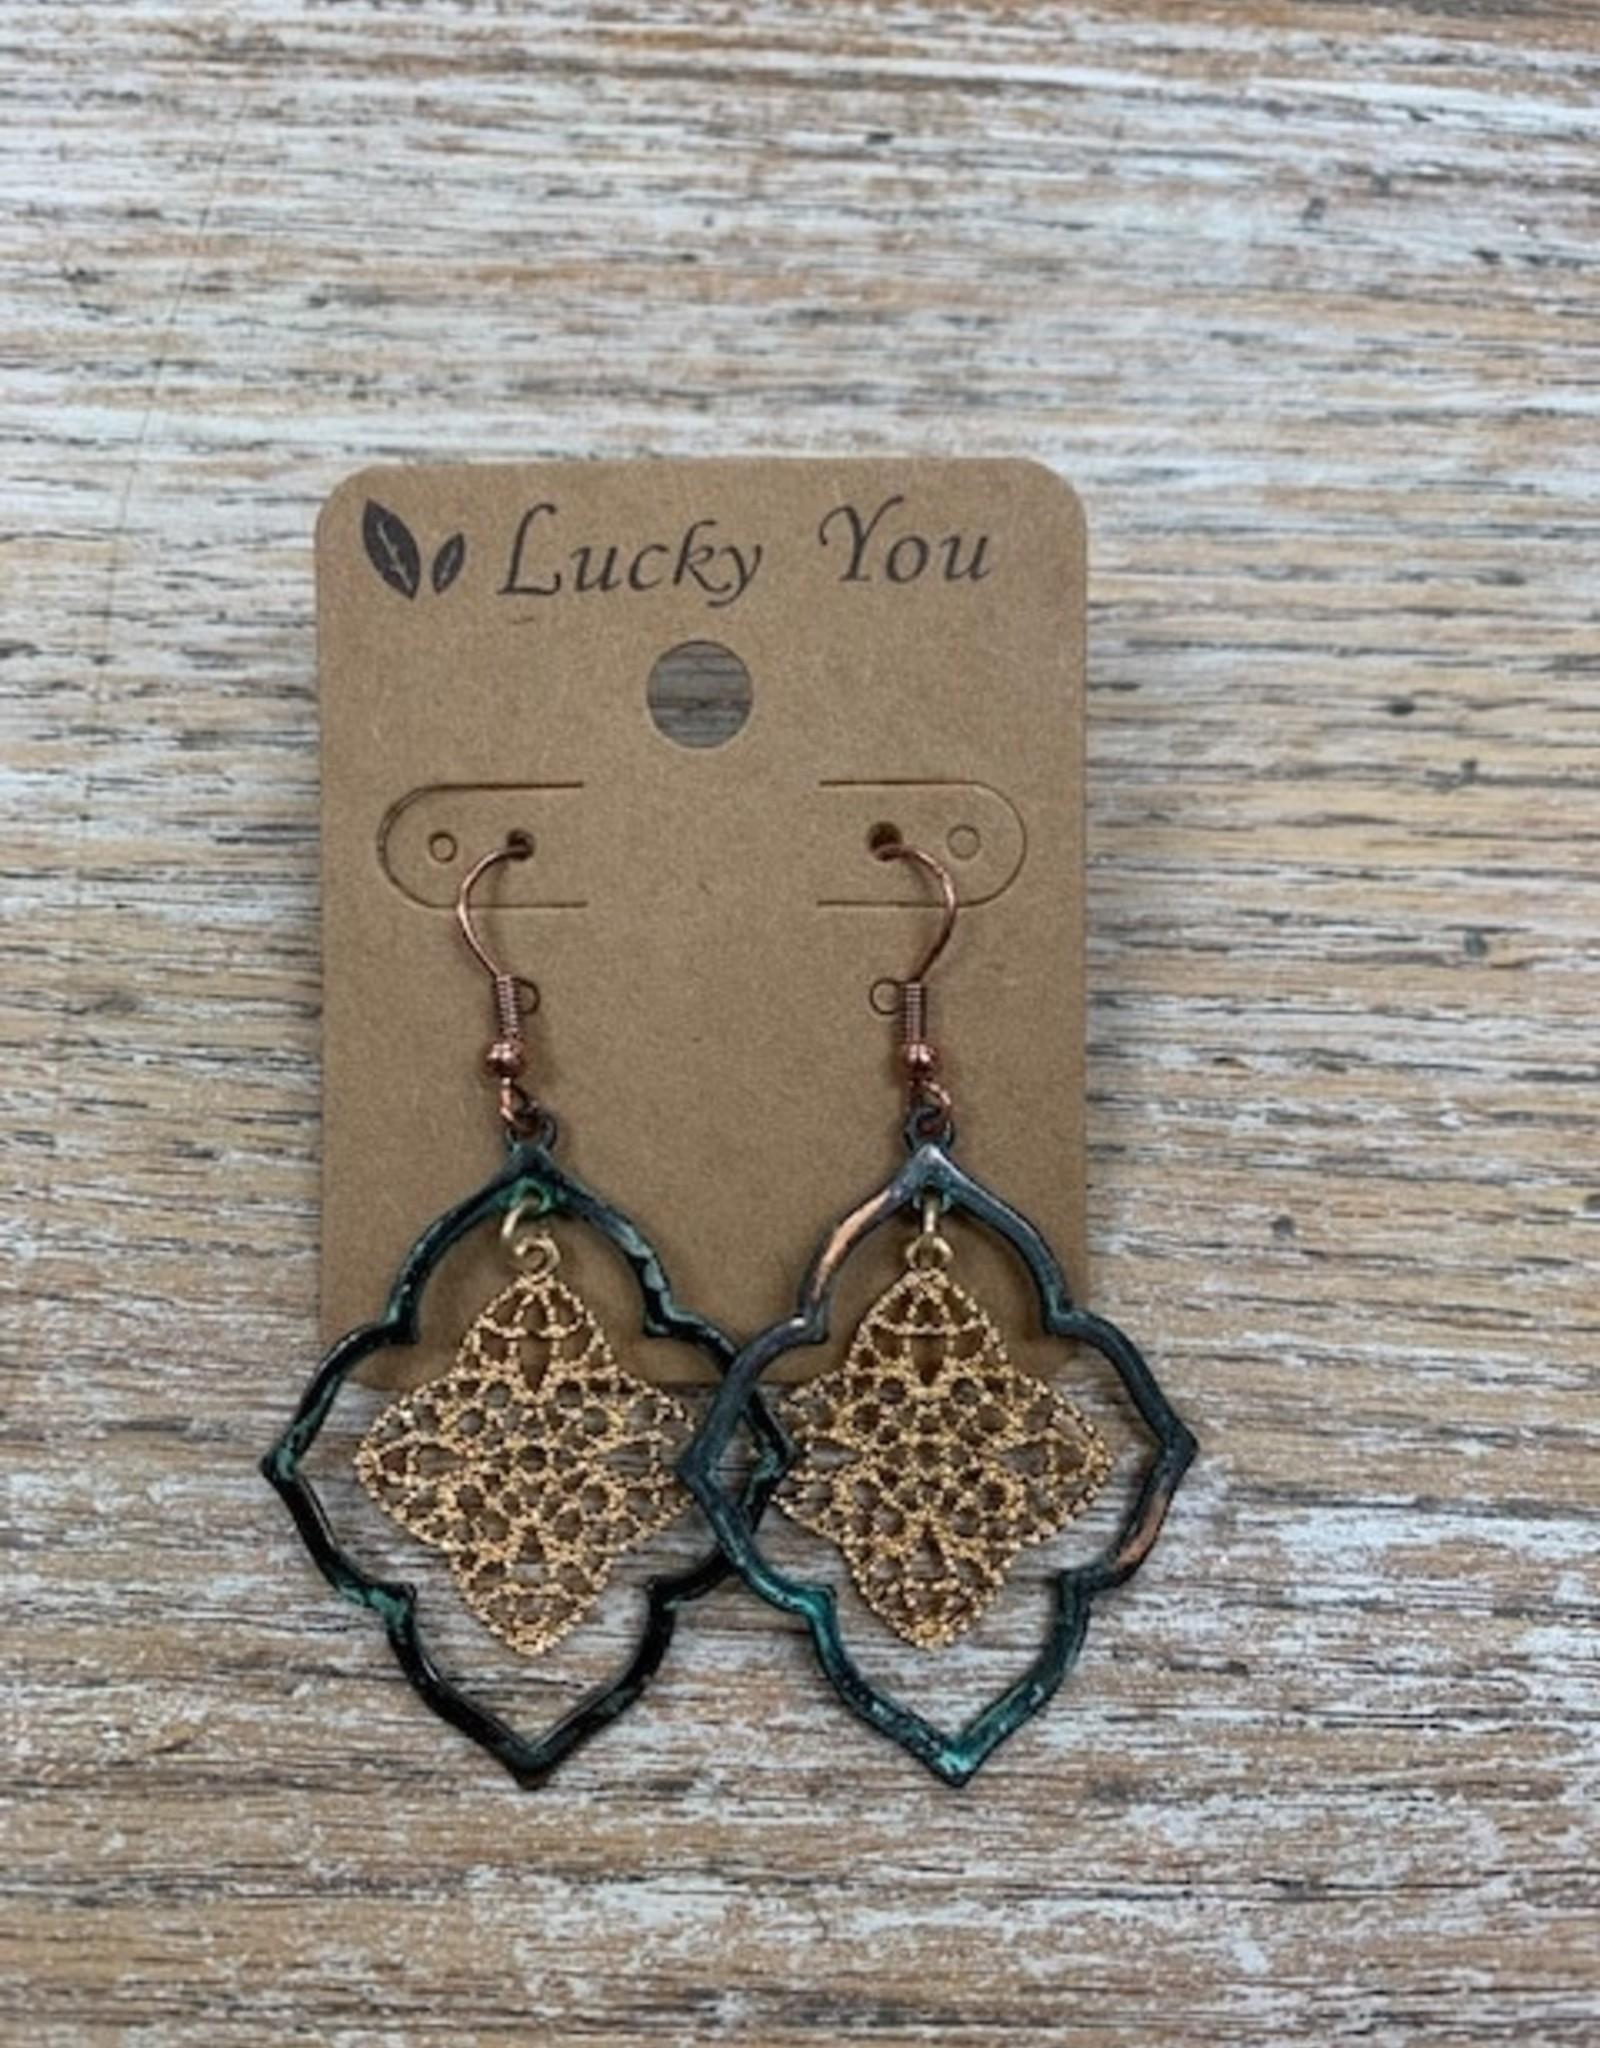 Jewelry Patina Gold Flowerish Earrings